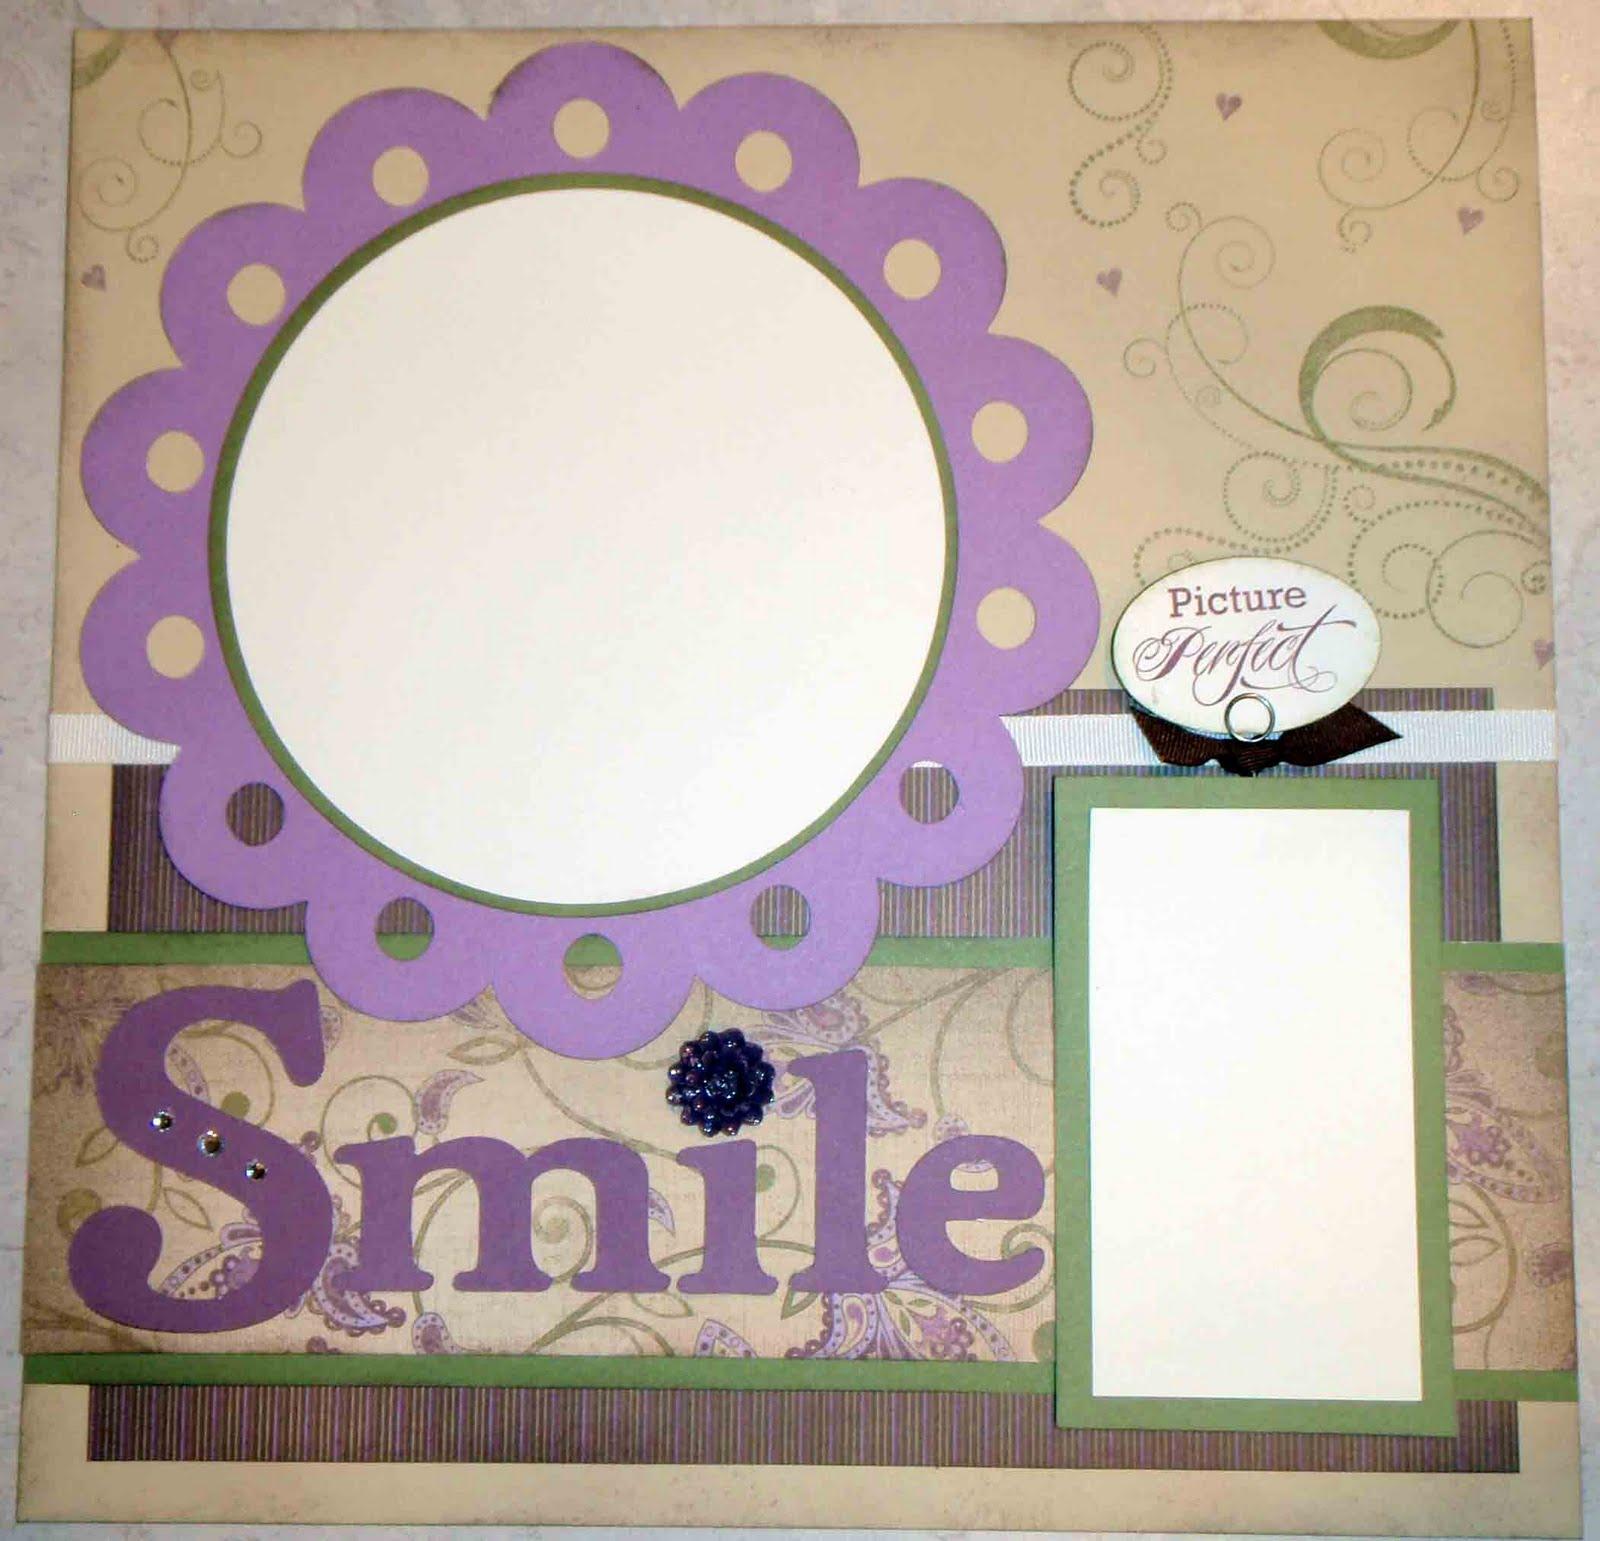 http://3.bp.blogspot.com/-l3yefXpy9fo/TmhWy_64ygI/AAAAAAAAAPk/WU9VdPAw0BA/s1600/sonoma-layout.jpg